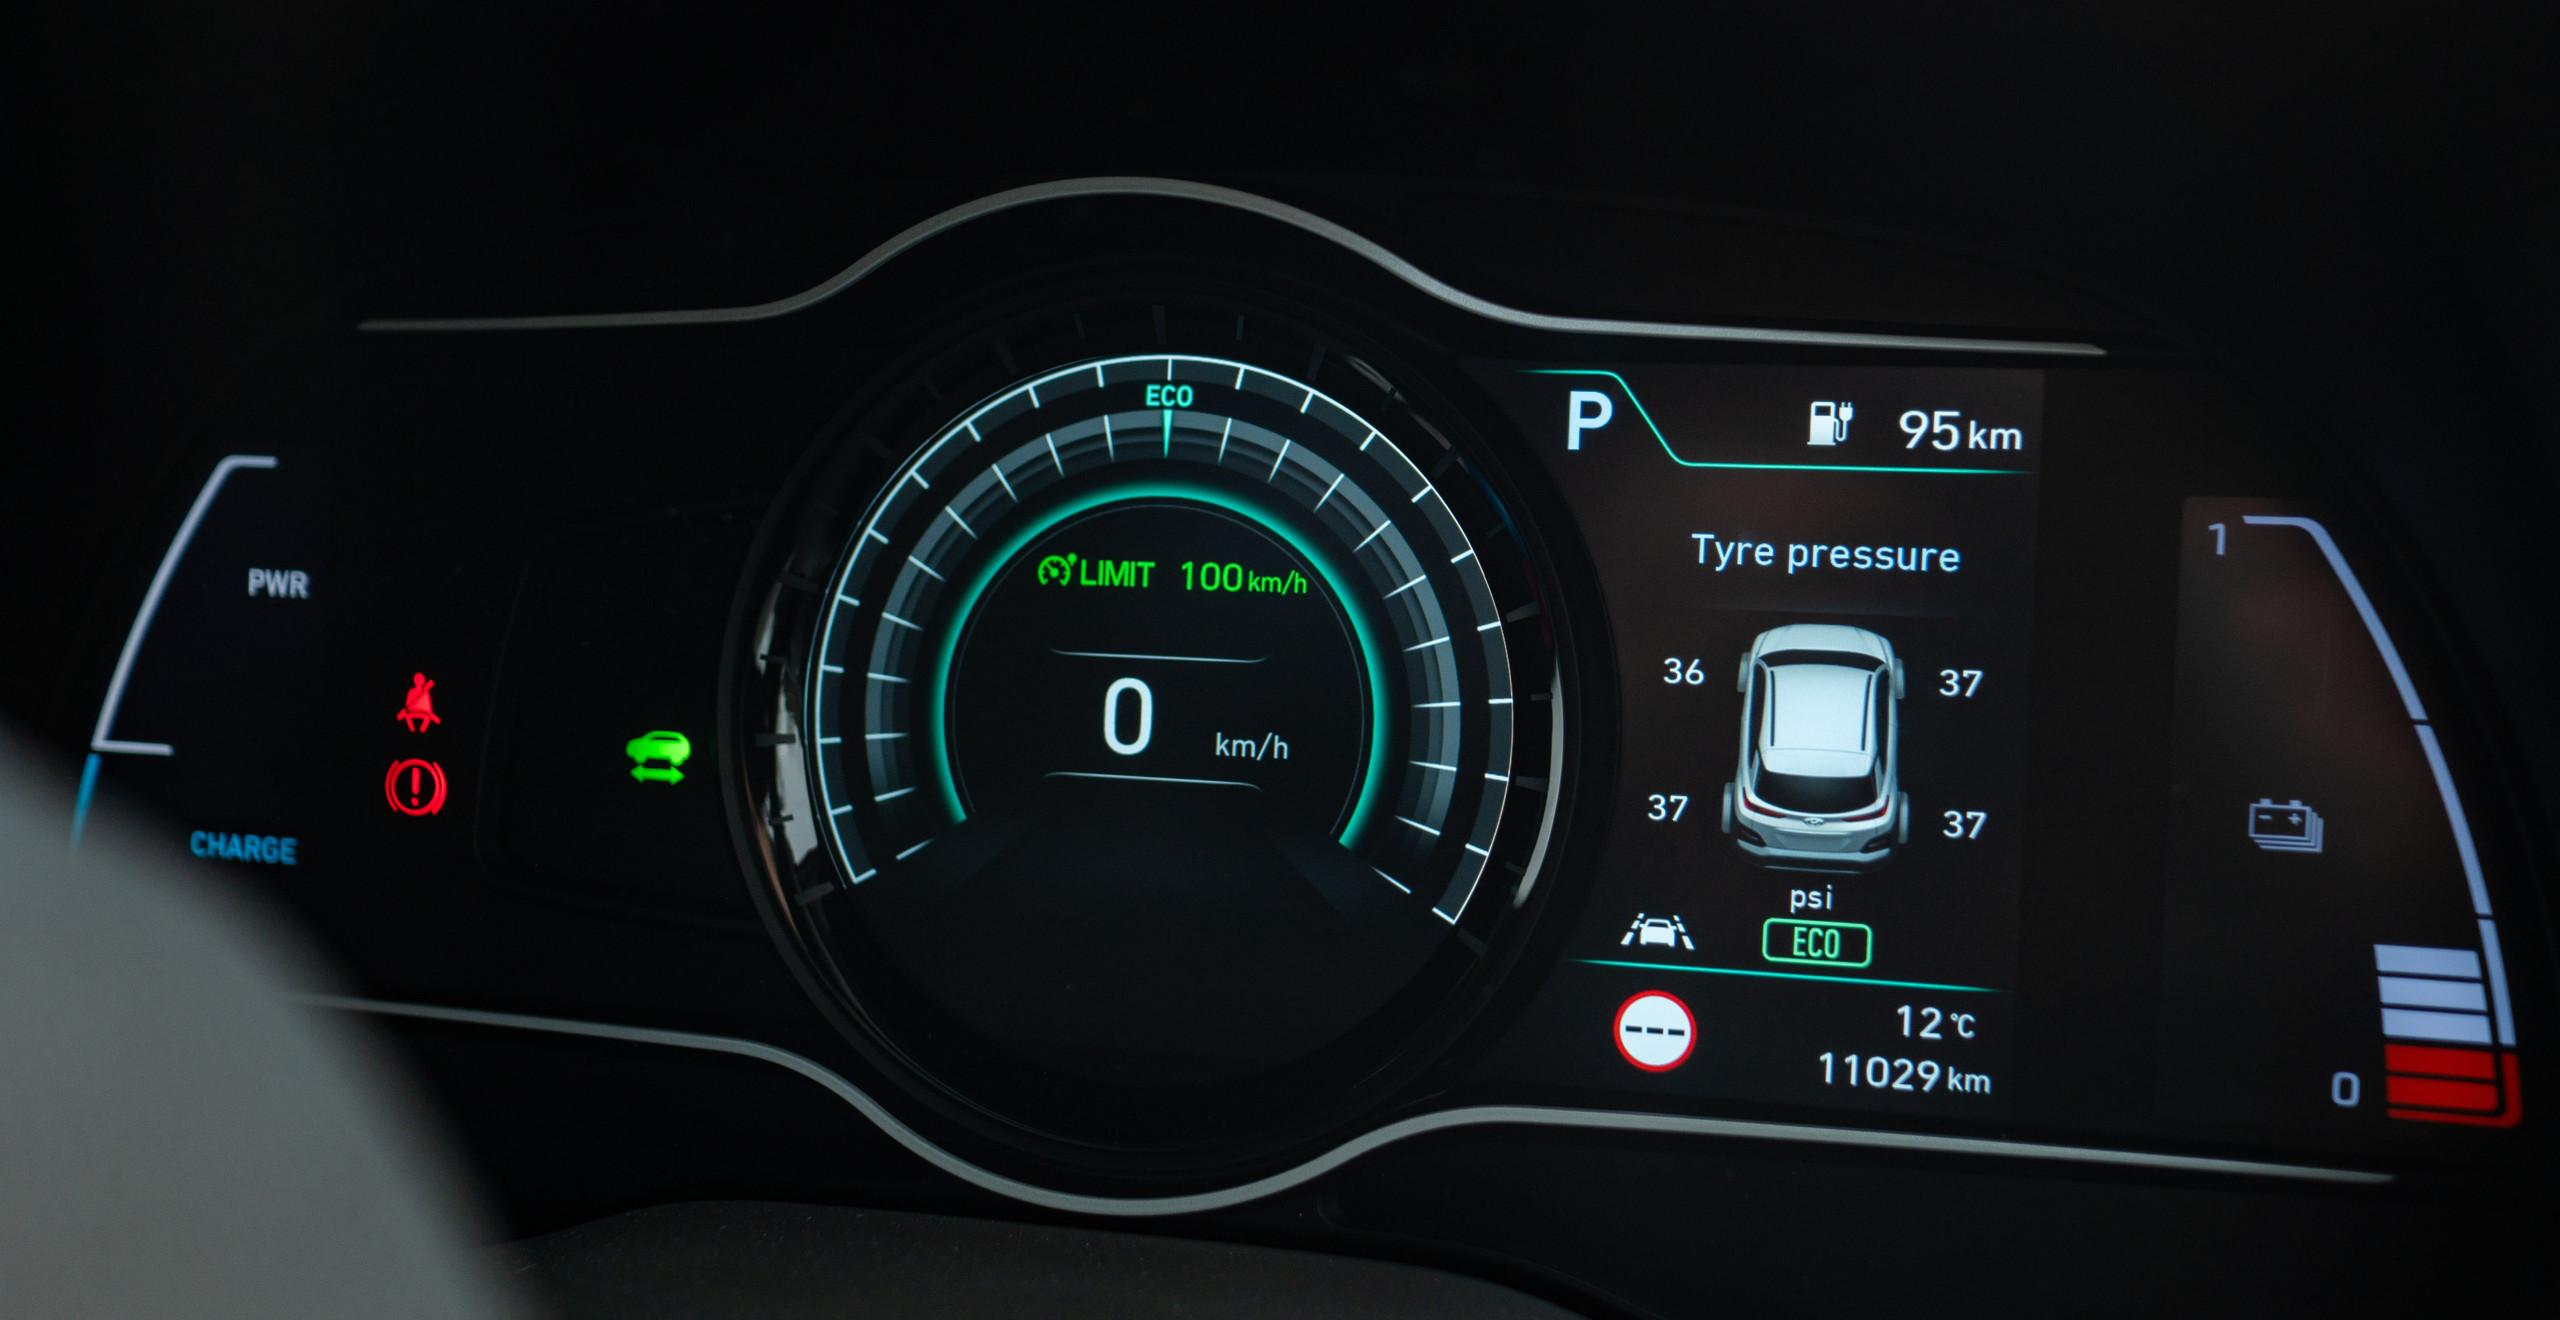 Hyundai Kona Electric dashboard instrument cluster 2018 tyre pressure speedometer